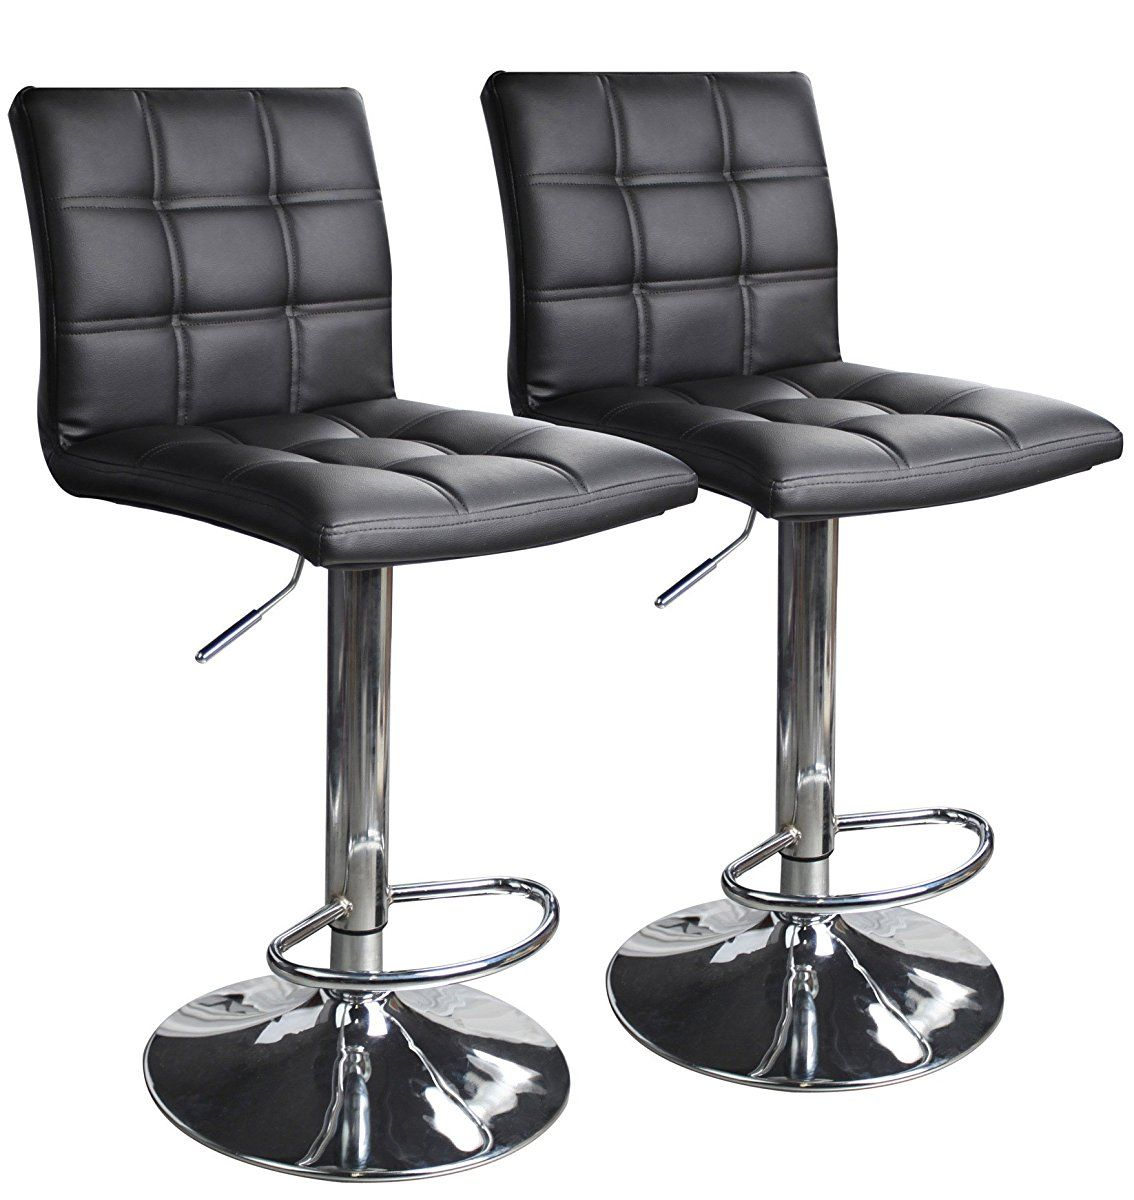 Modern Square Leather Adjustable Bar Stools With Back Set Of 2